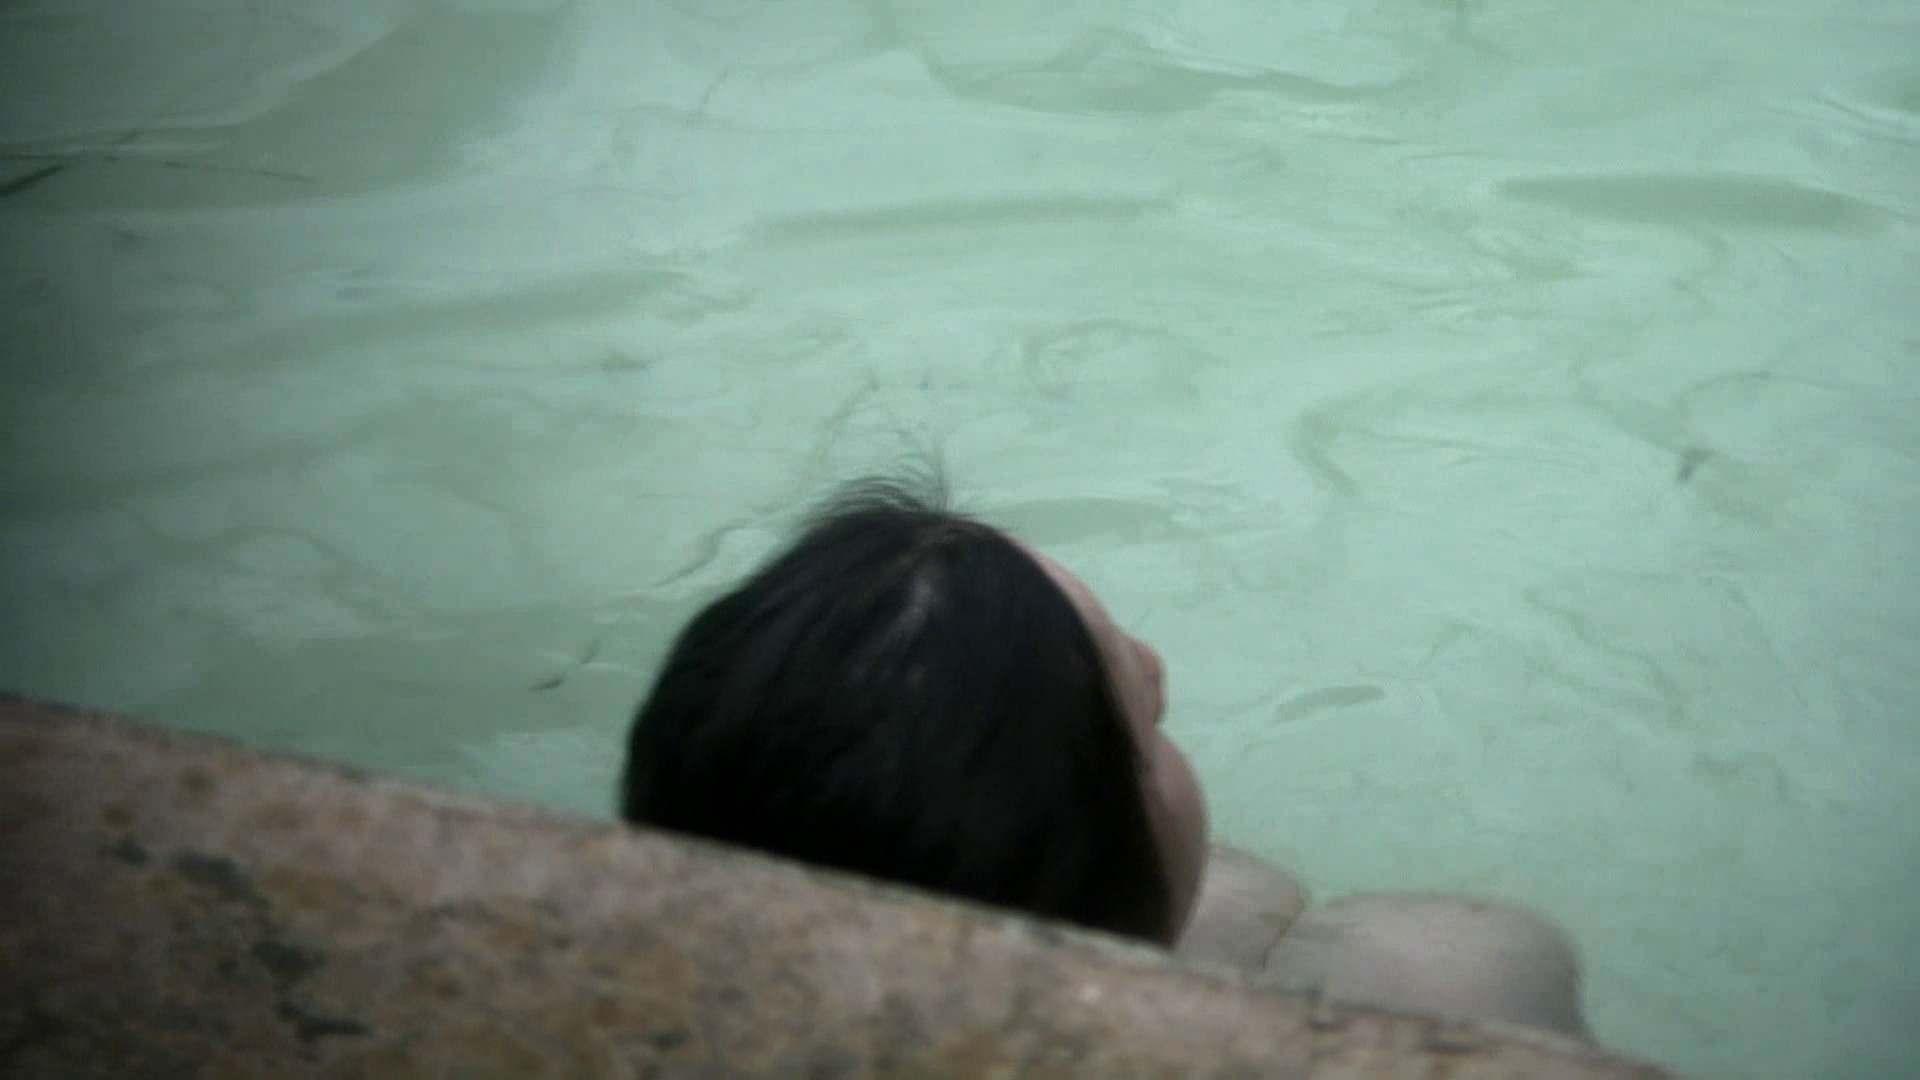 Aquaな露天風呂Vol.656 露天風呂編  91PIX 22